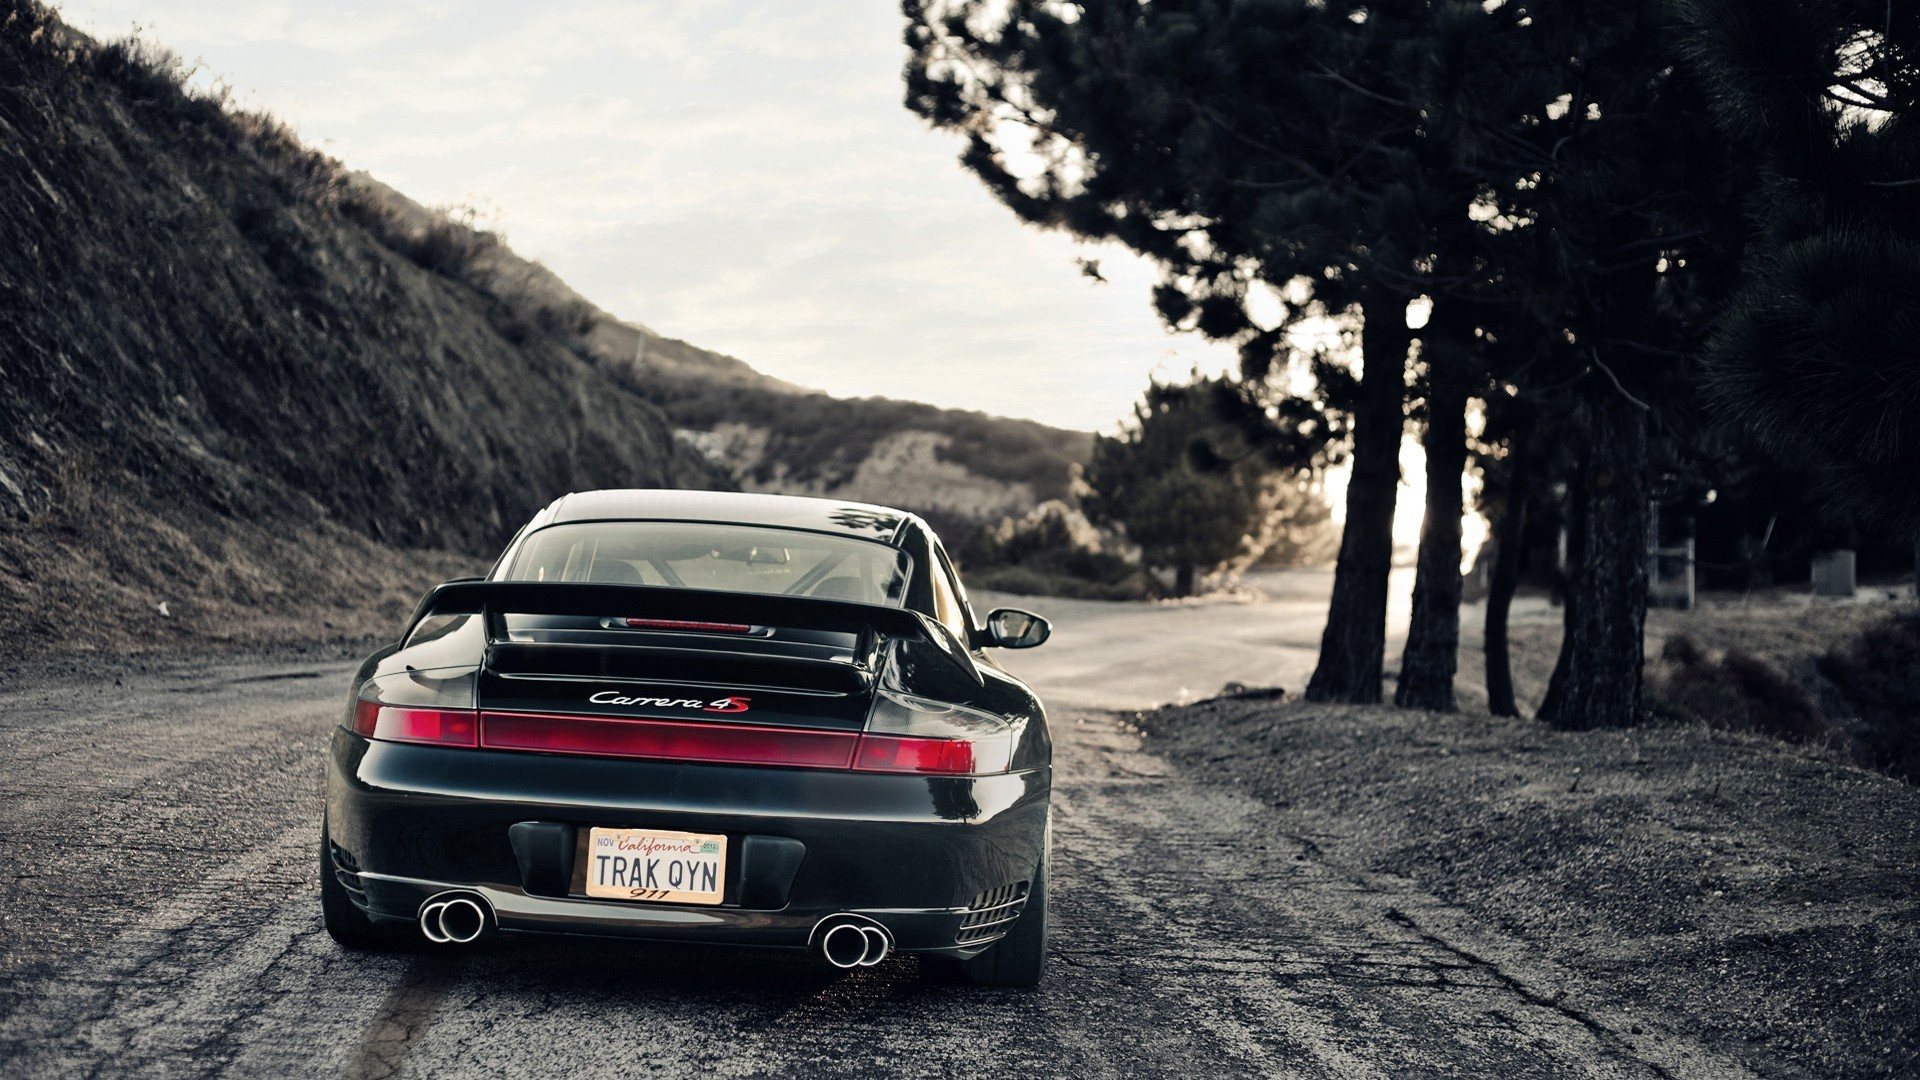 Porsche 911 Wallpaper 84 Pictures